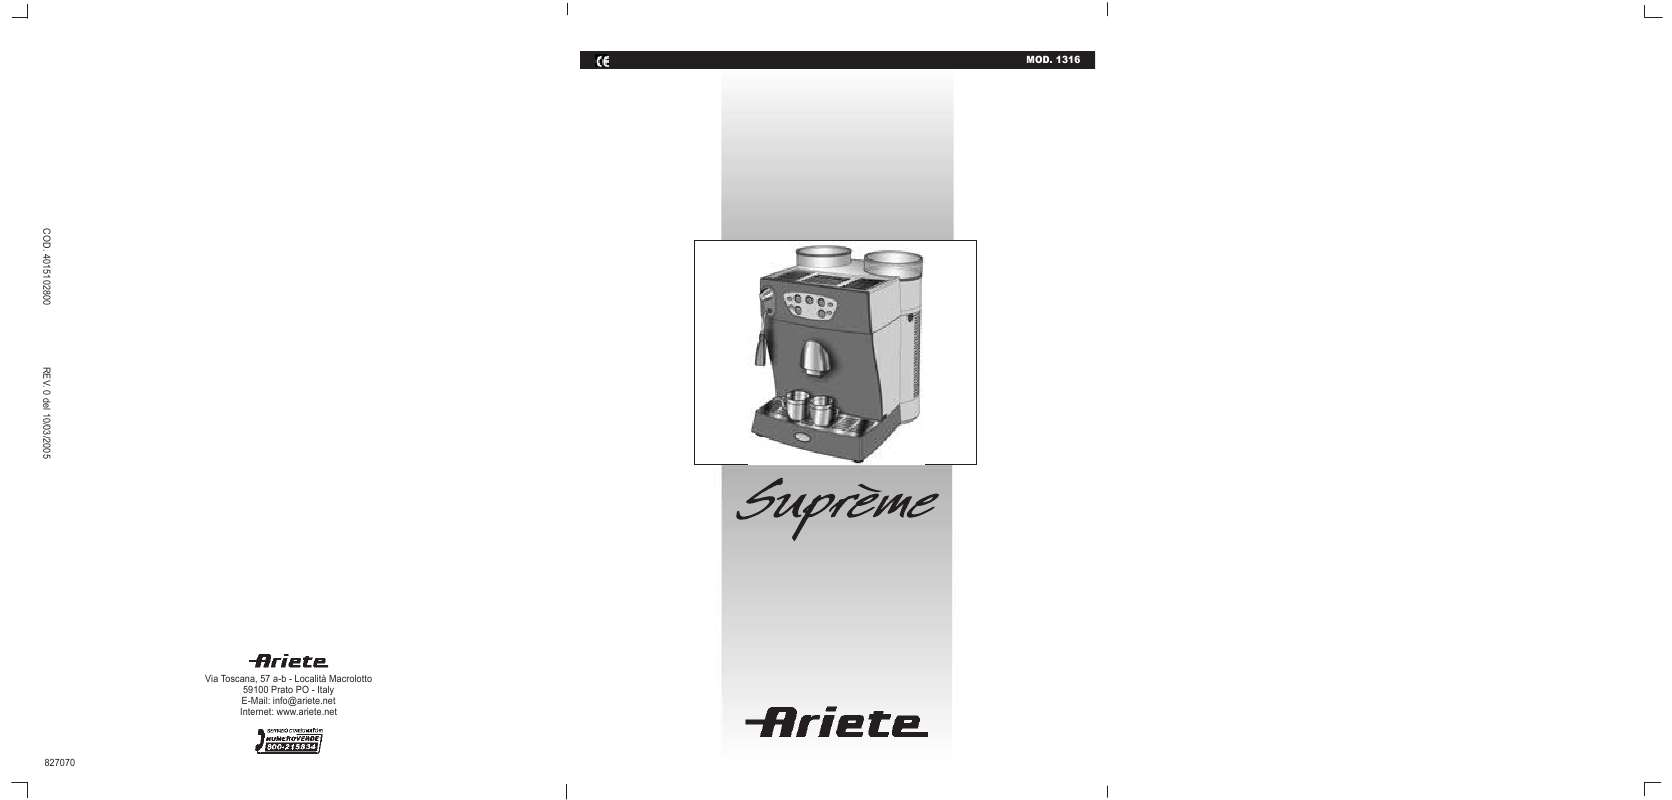 Guide utilisation ARIETE SUPREME 1316 de la marque ARIETE